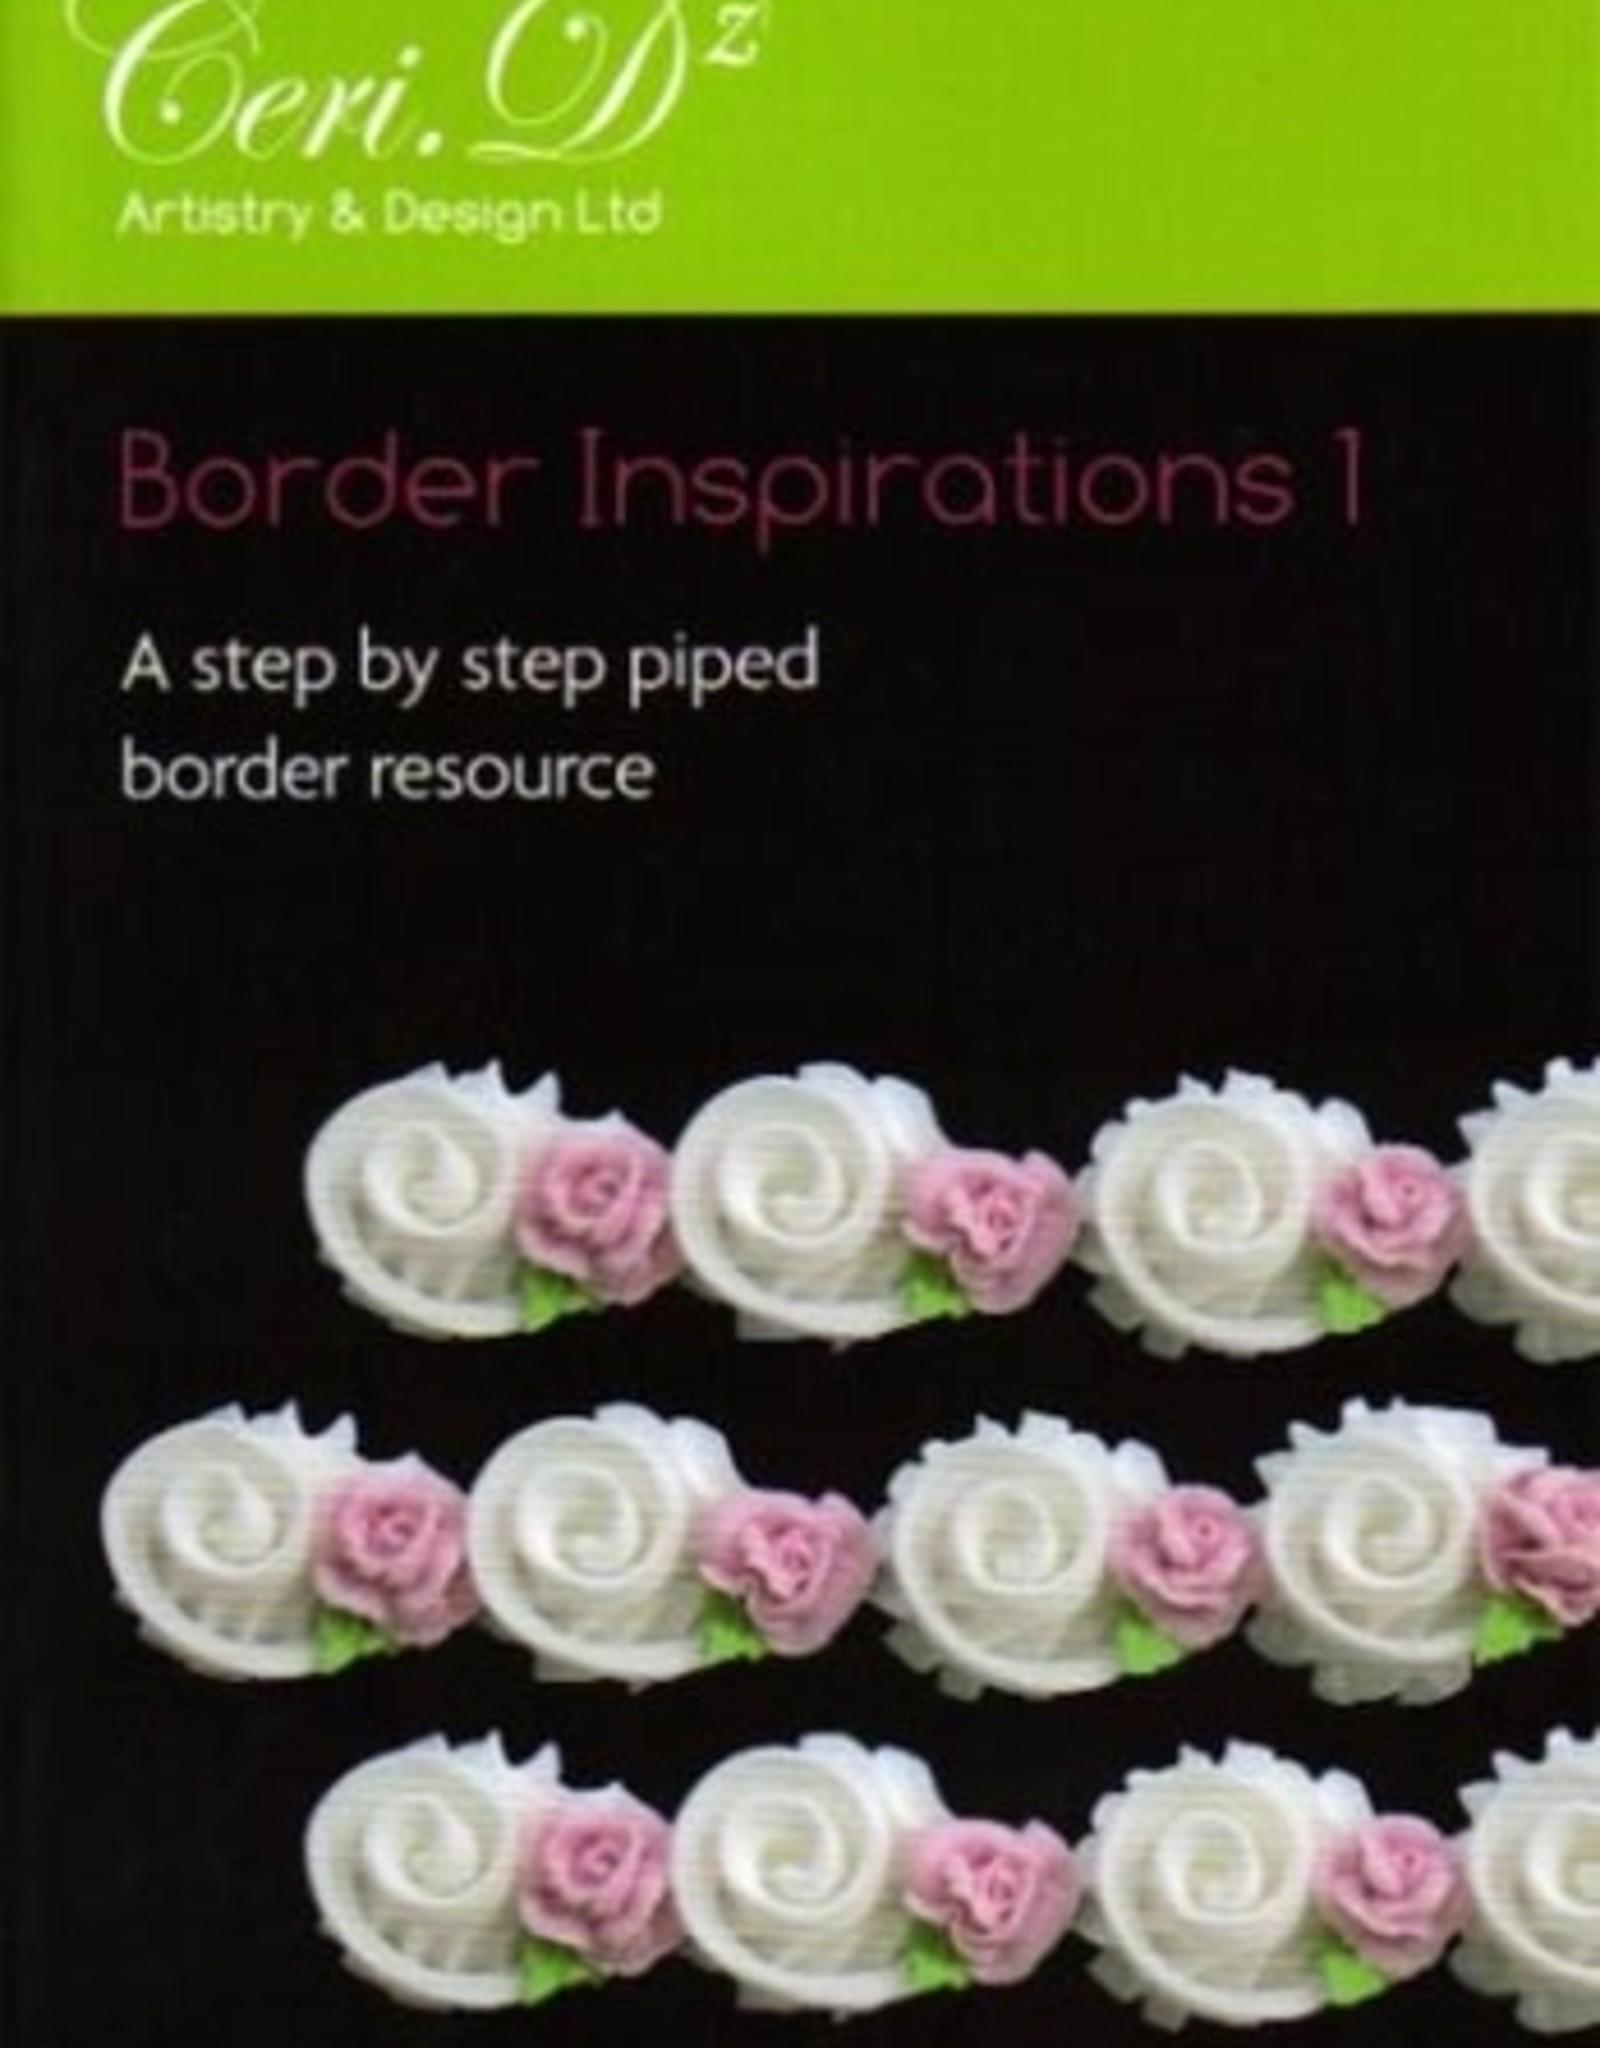 Border Inspirations 1 - Ceri DD Griffiths